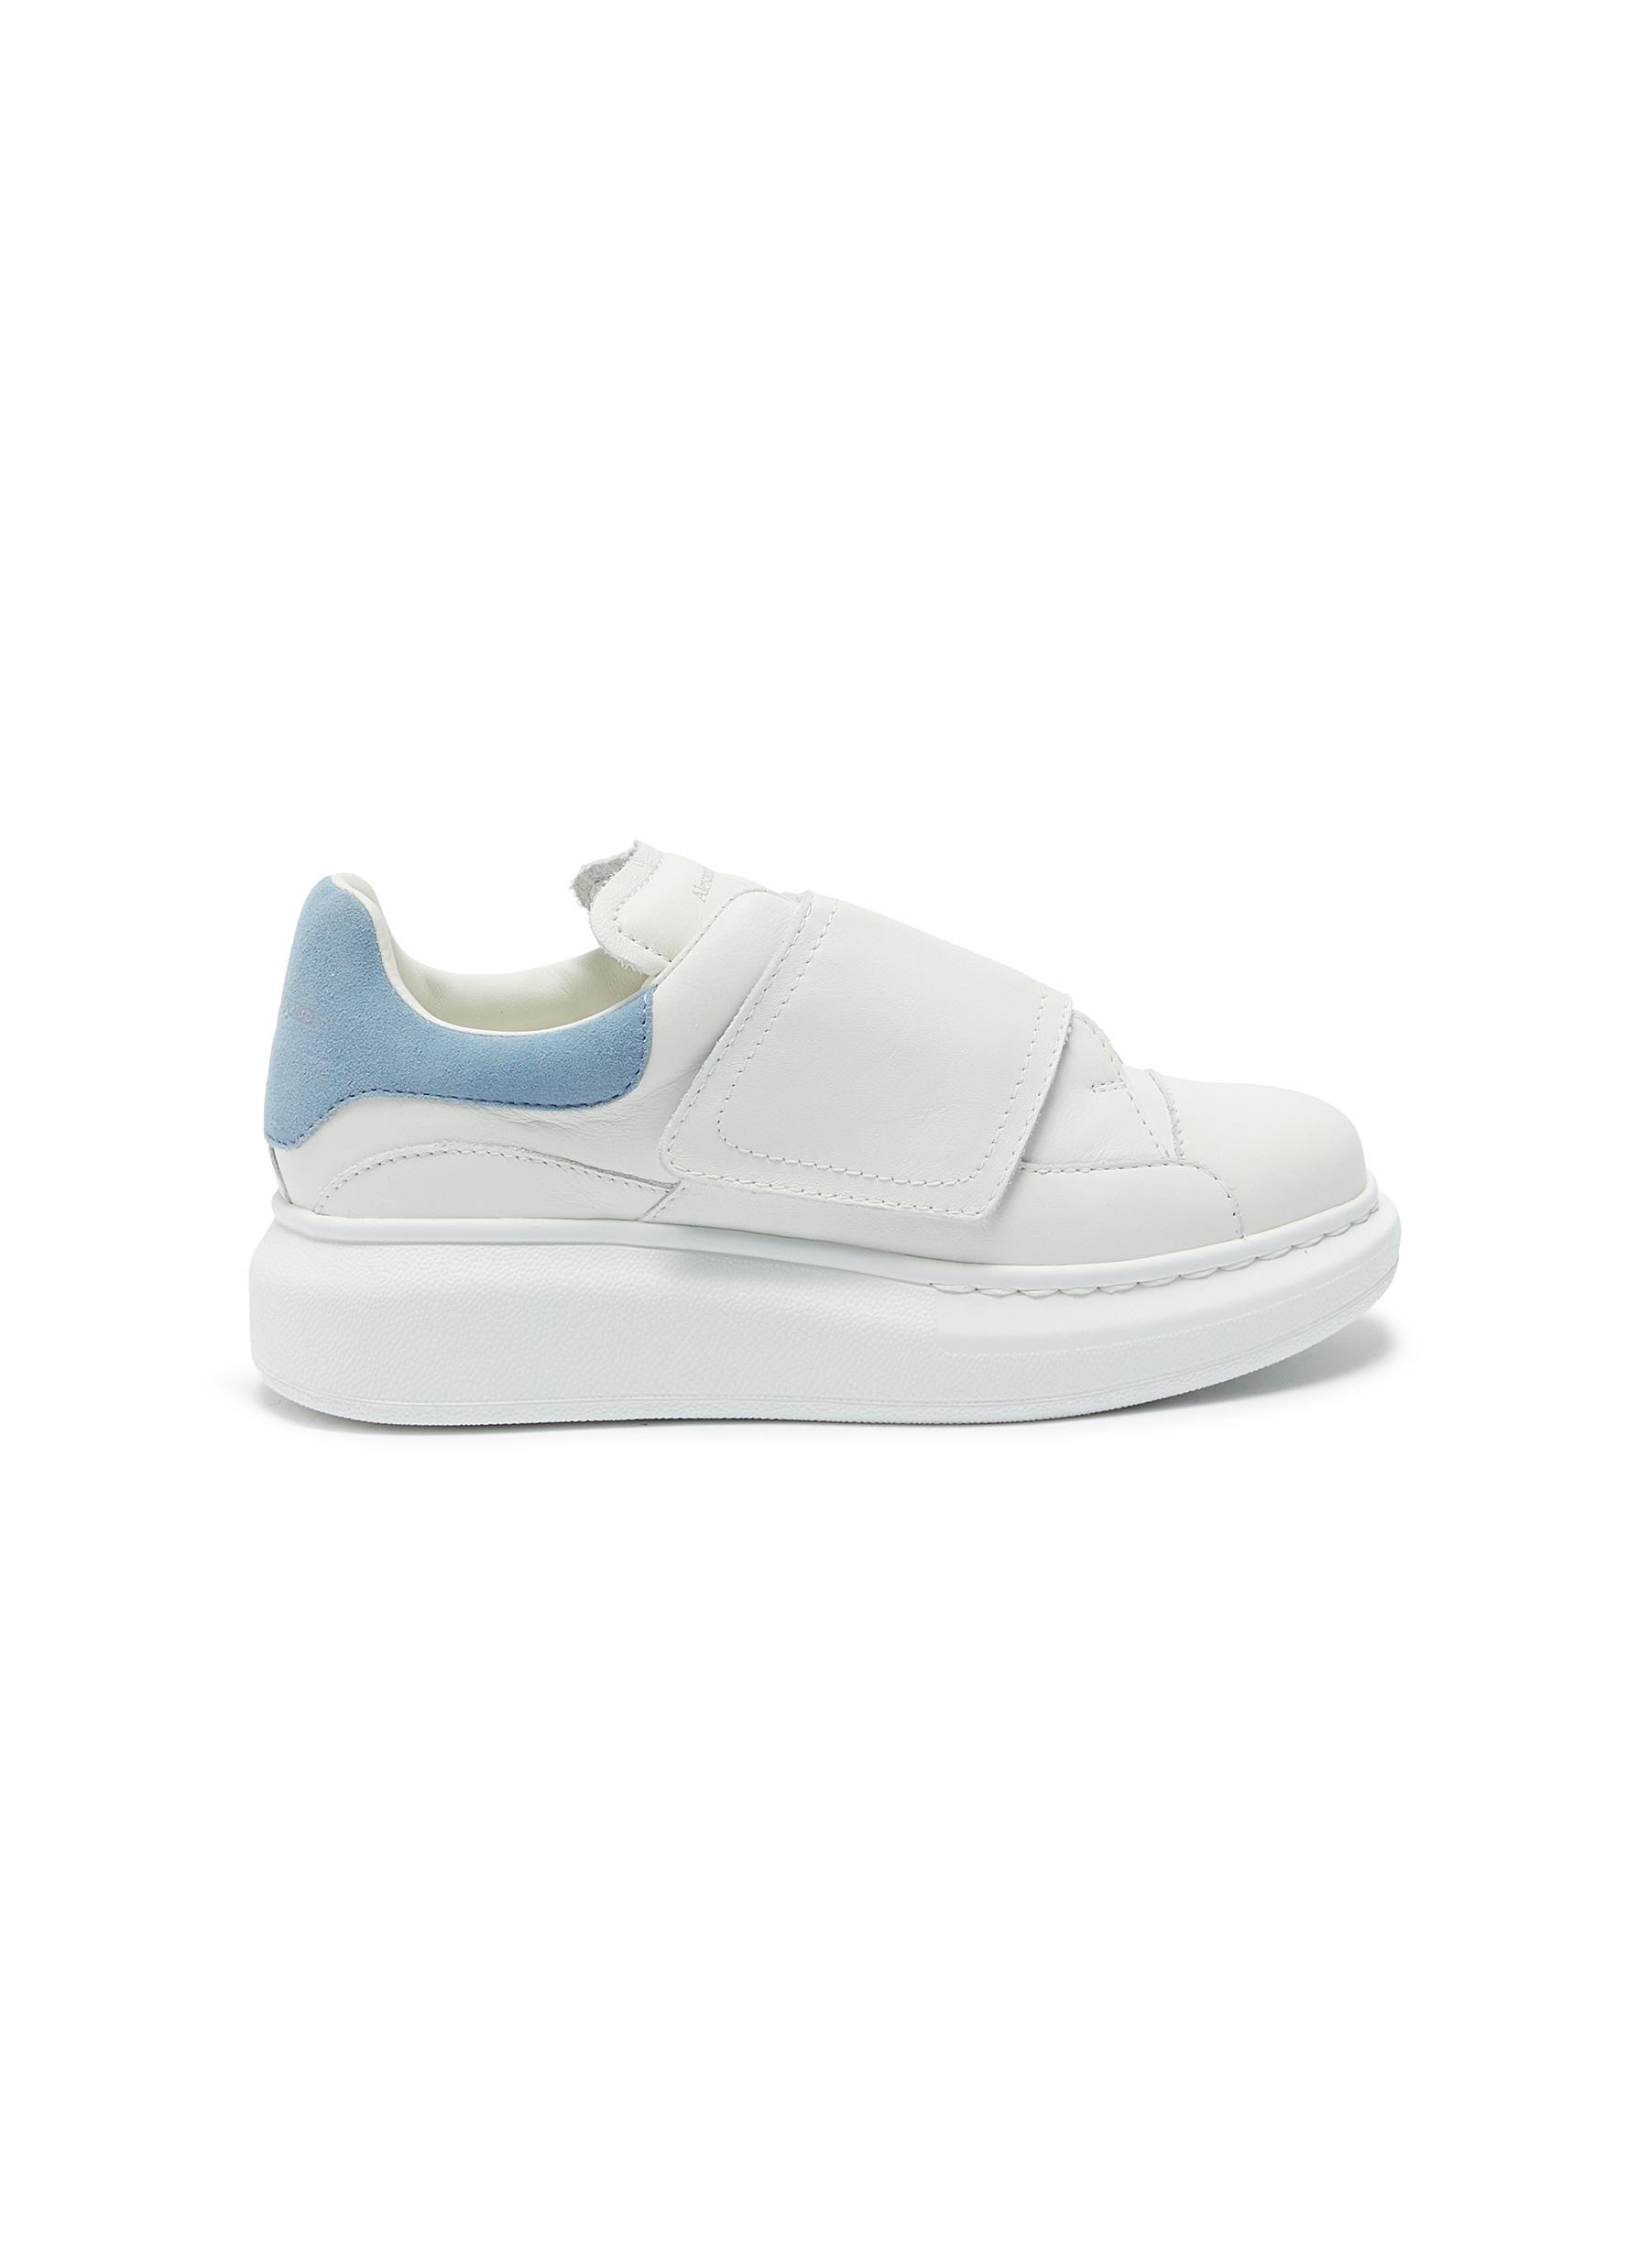 Velcro sneaker chunky outsole kids